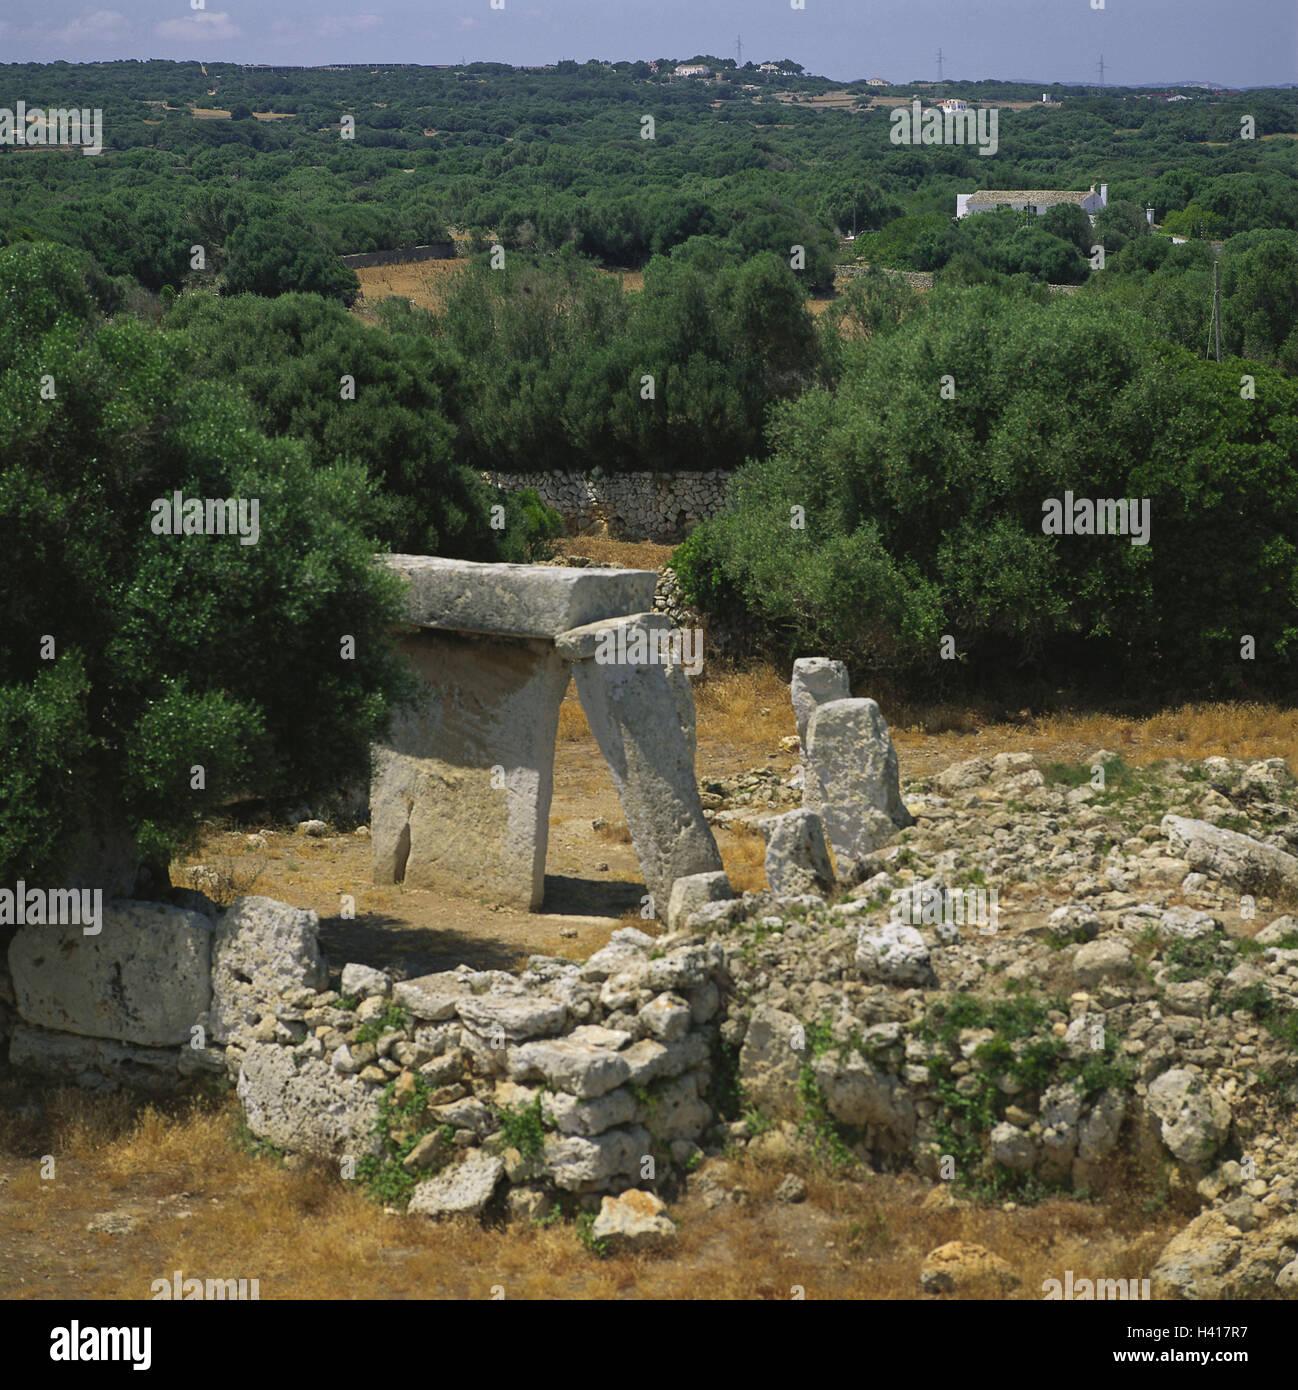 Spain, Menorca, Mao, scenery, Talati de Dalt, 'Taula', stone formations, the Balearic Islands, island, the - Stock Image